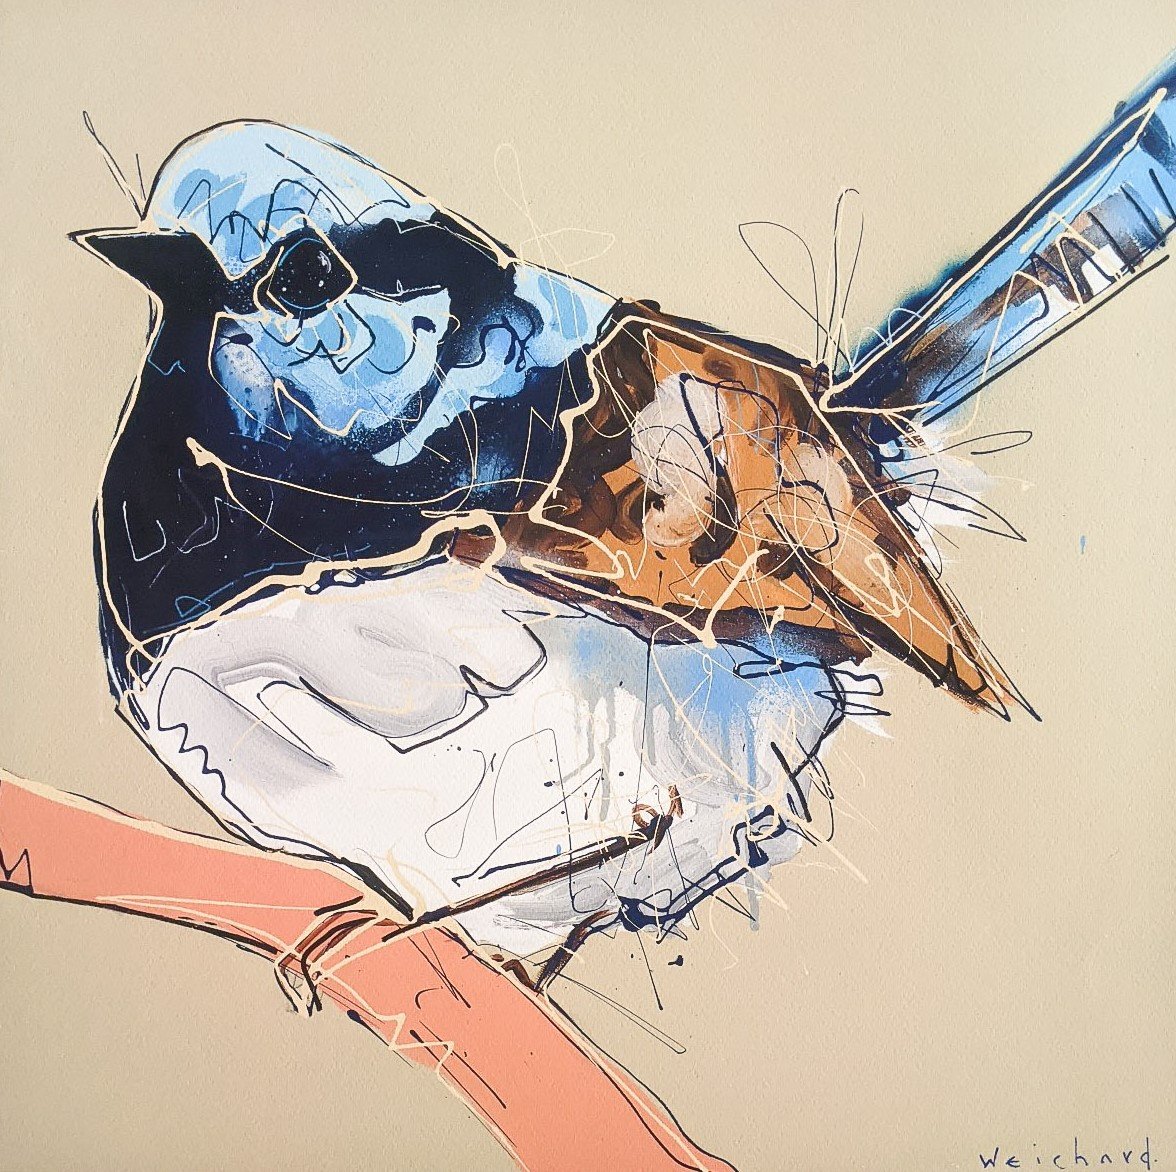 Balanced in Blue - Limited Edition Wren Bird Print - Aidan Weichard - Native Bird Art